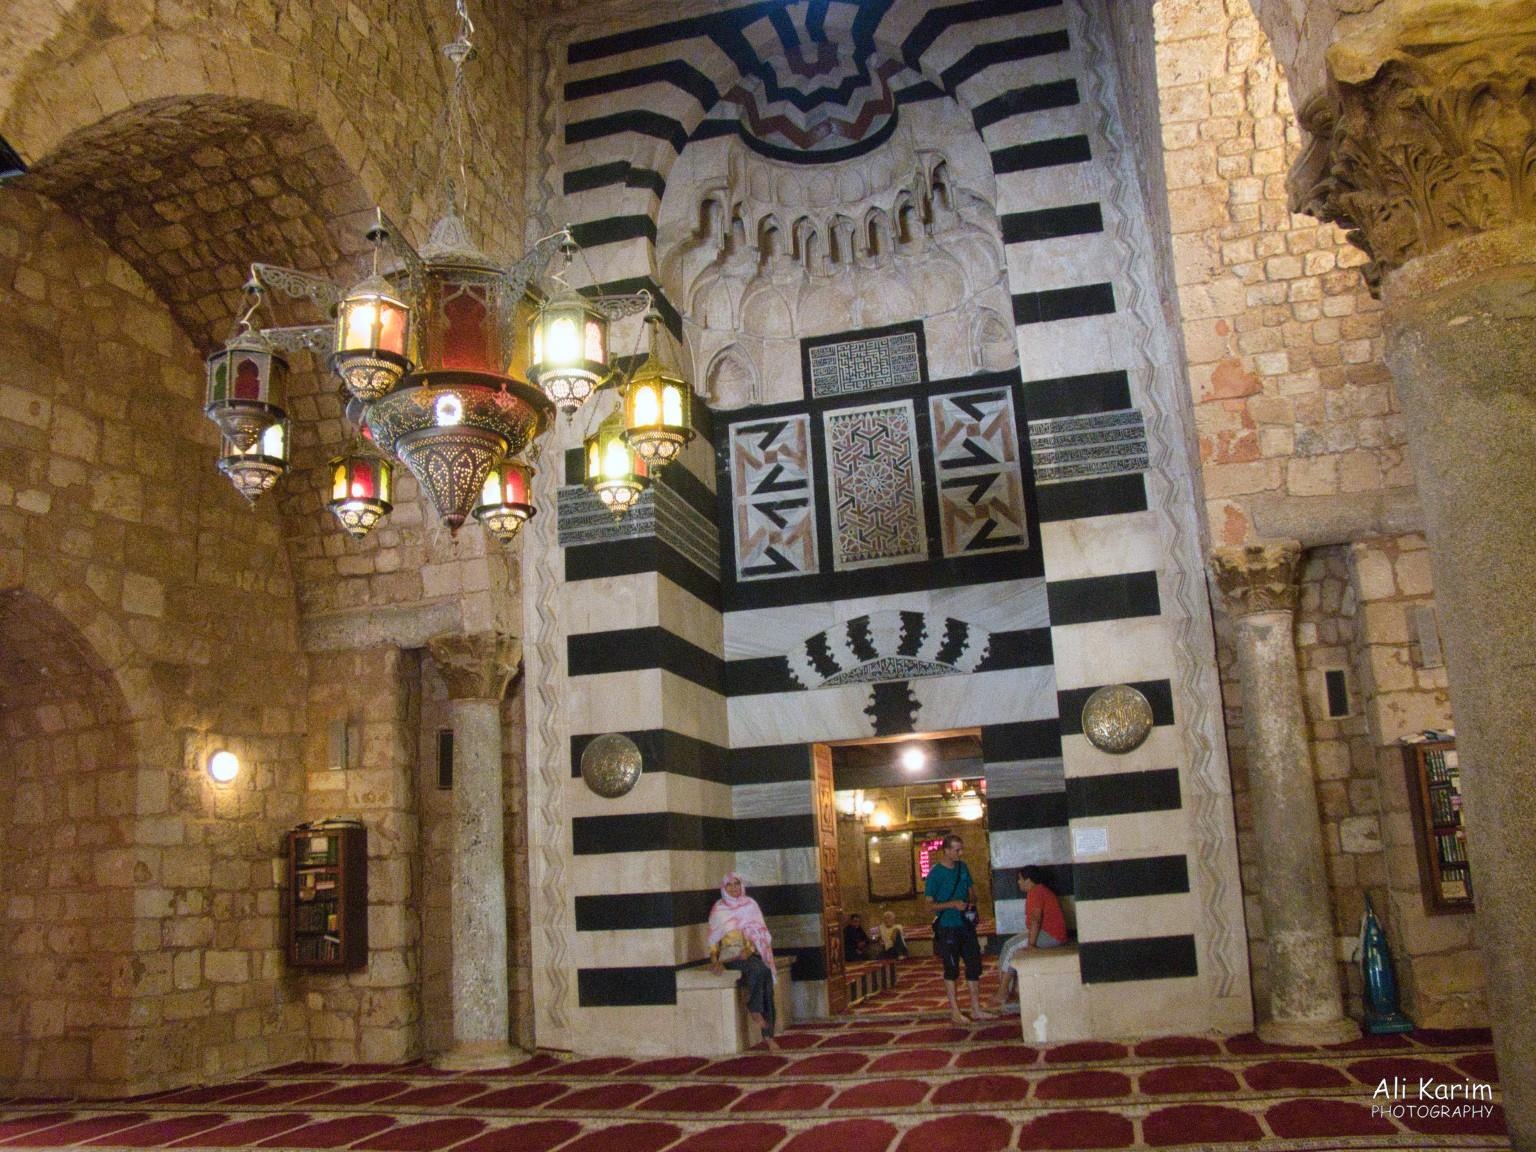 Tripoli Lebanon Another interesting mosque